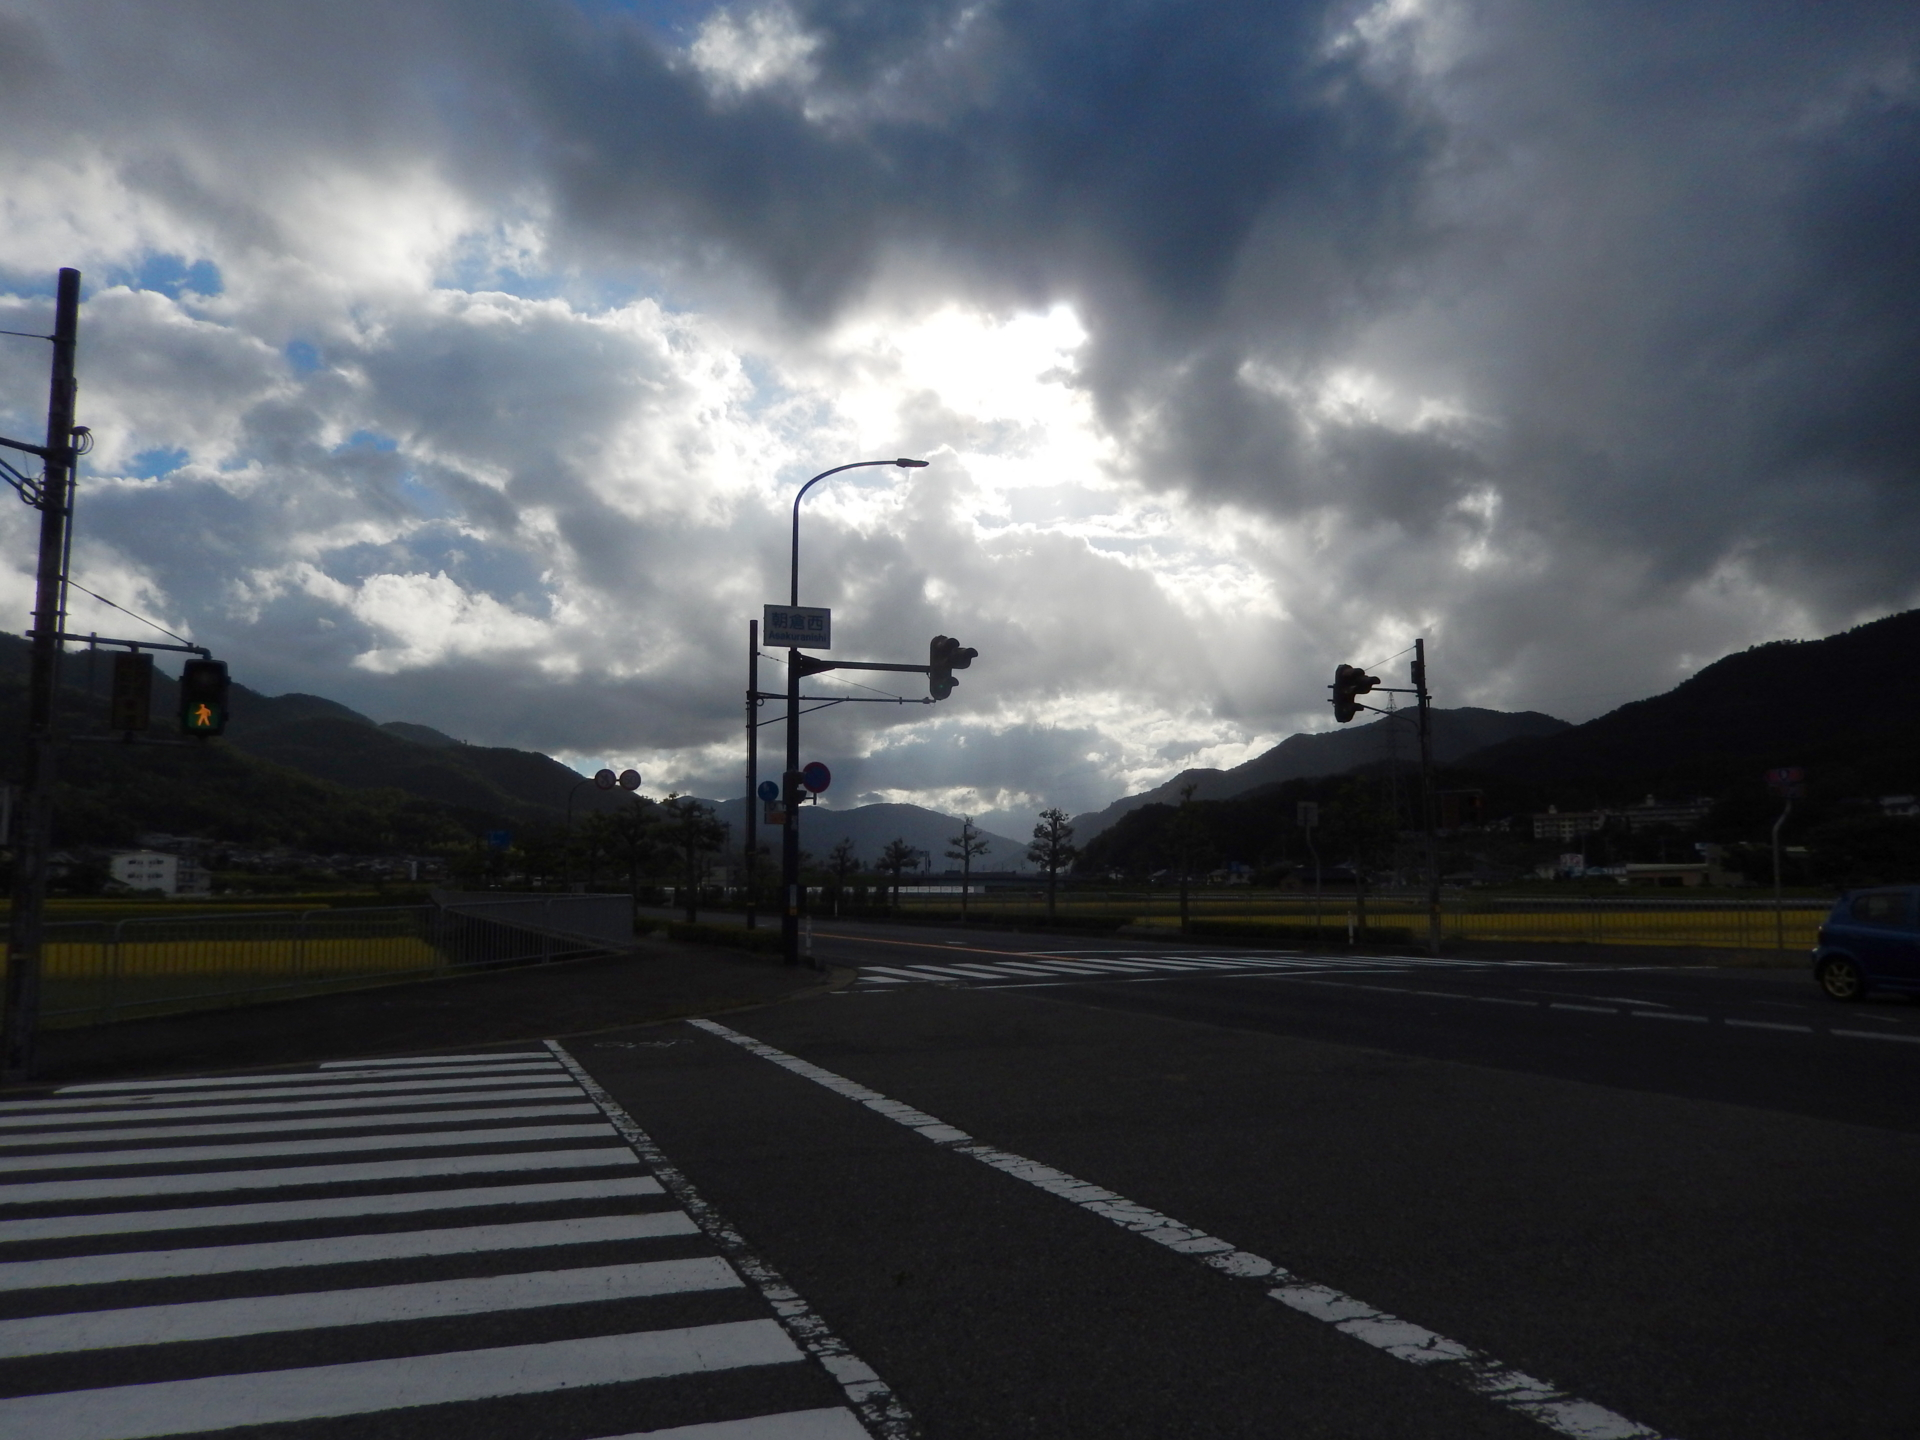 f:id:ToshUeno:20140913161905j:plain